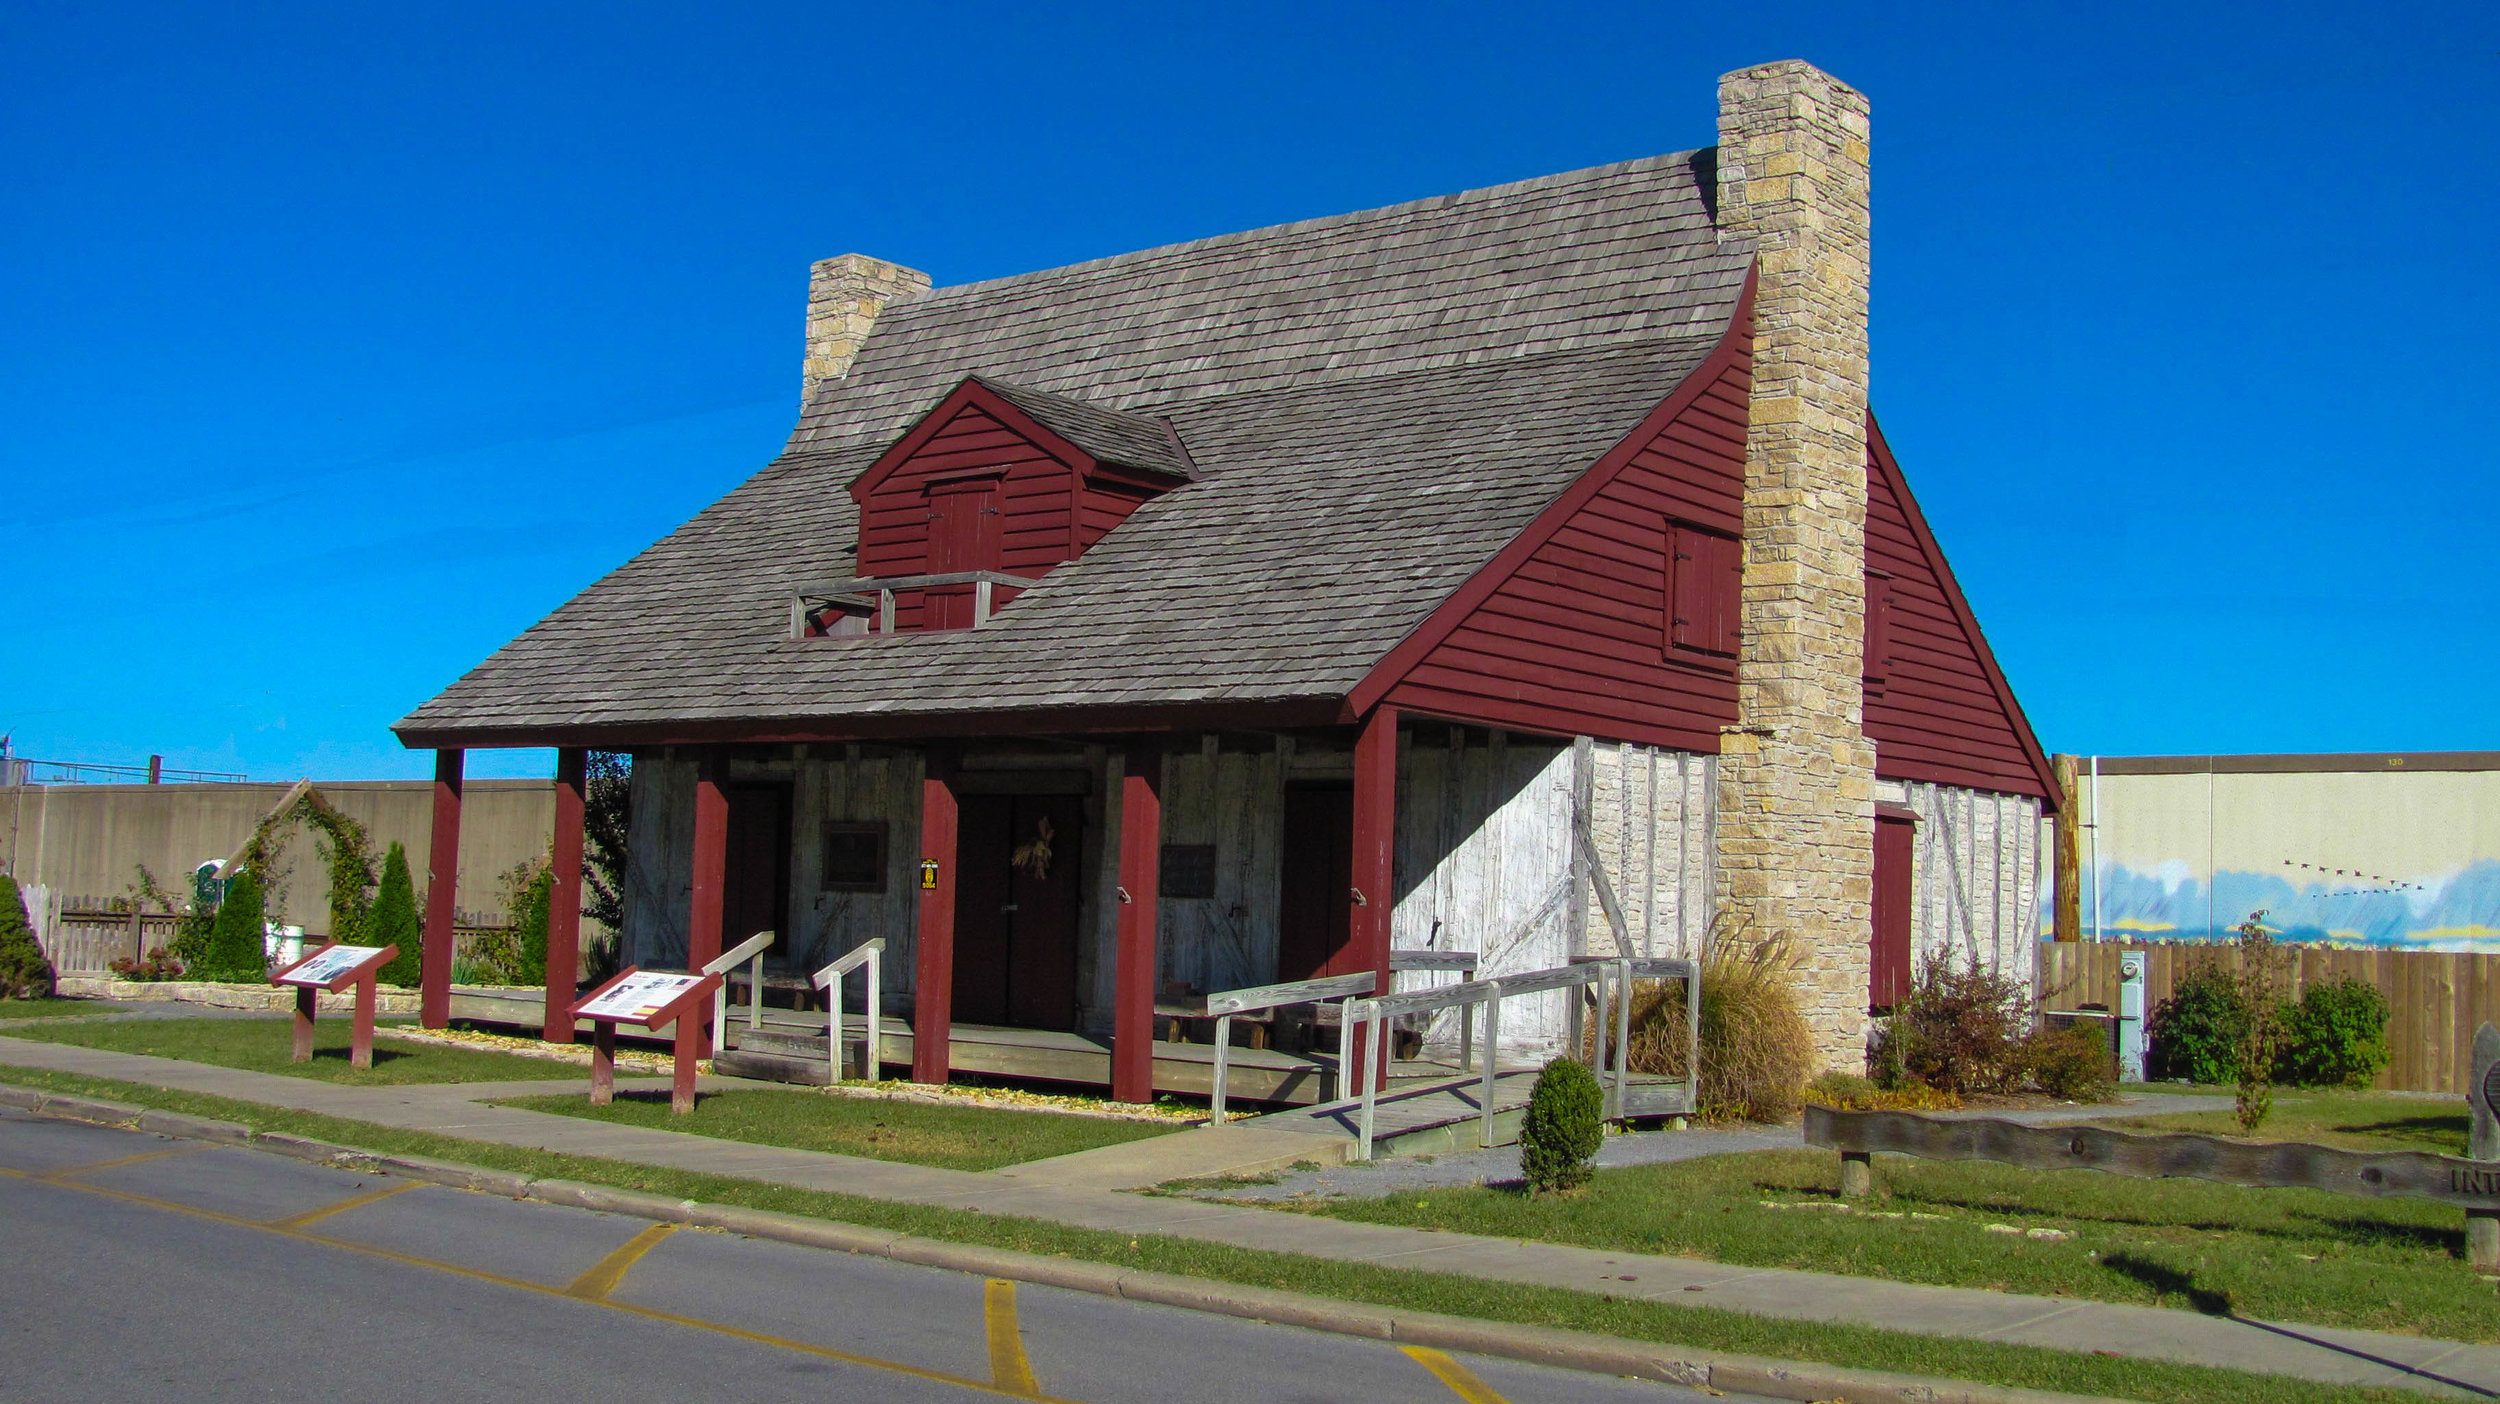 red-house-10142010-alr-0275.jpg